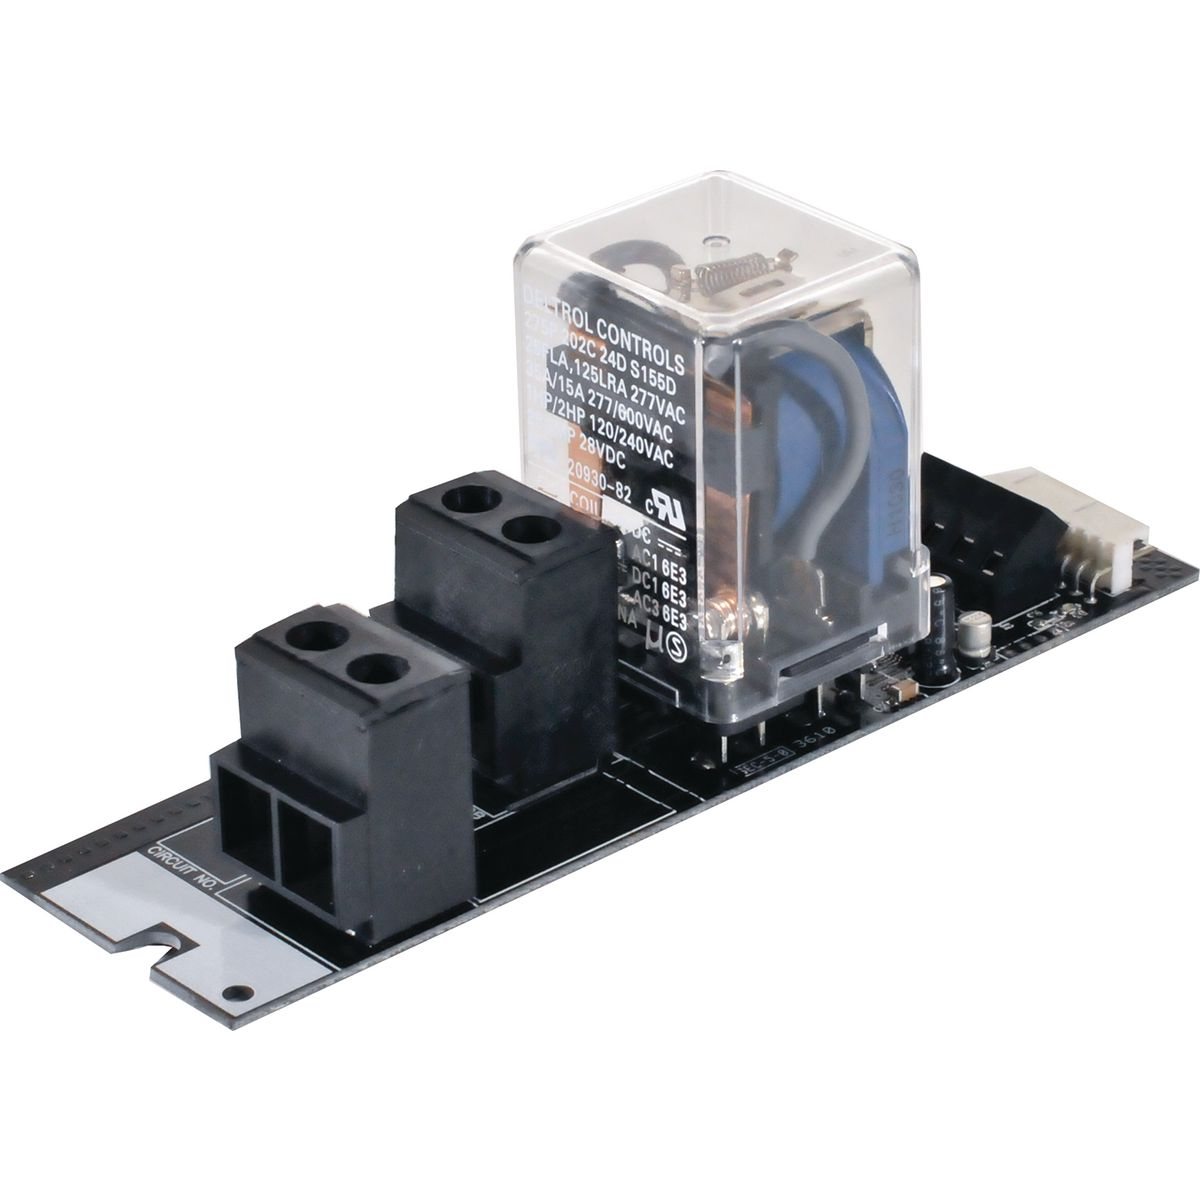 Cx Relays Brand Hubbell Control Solutions Relay Board No Nc Hcs Cxr2n 20a 1p Prodimage Cxr3l Cxr3lem Cxrtc Cxrtm